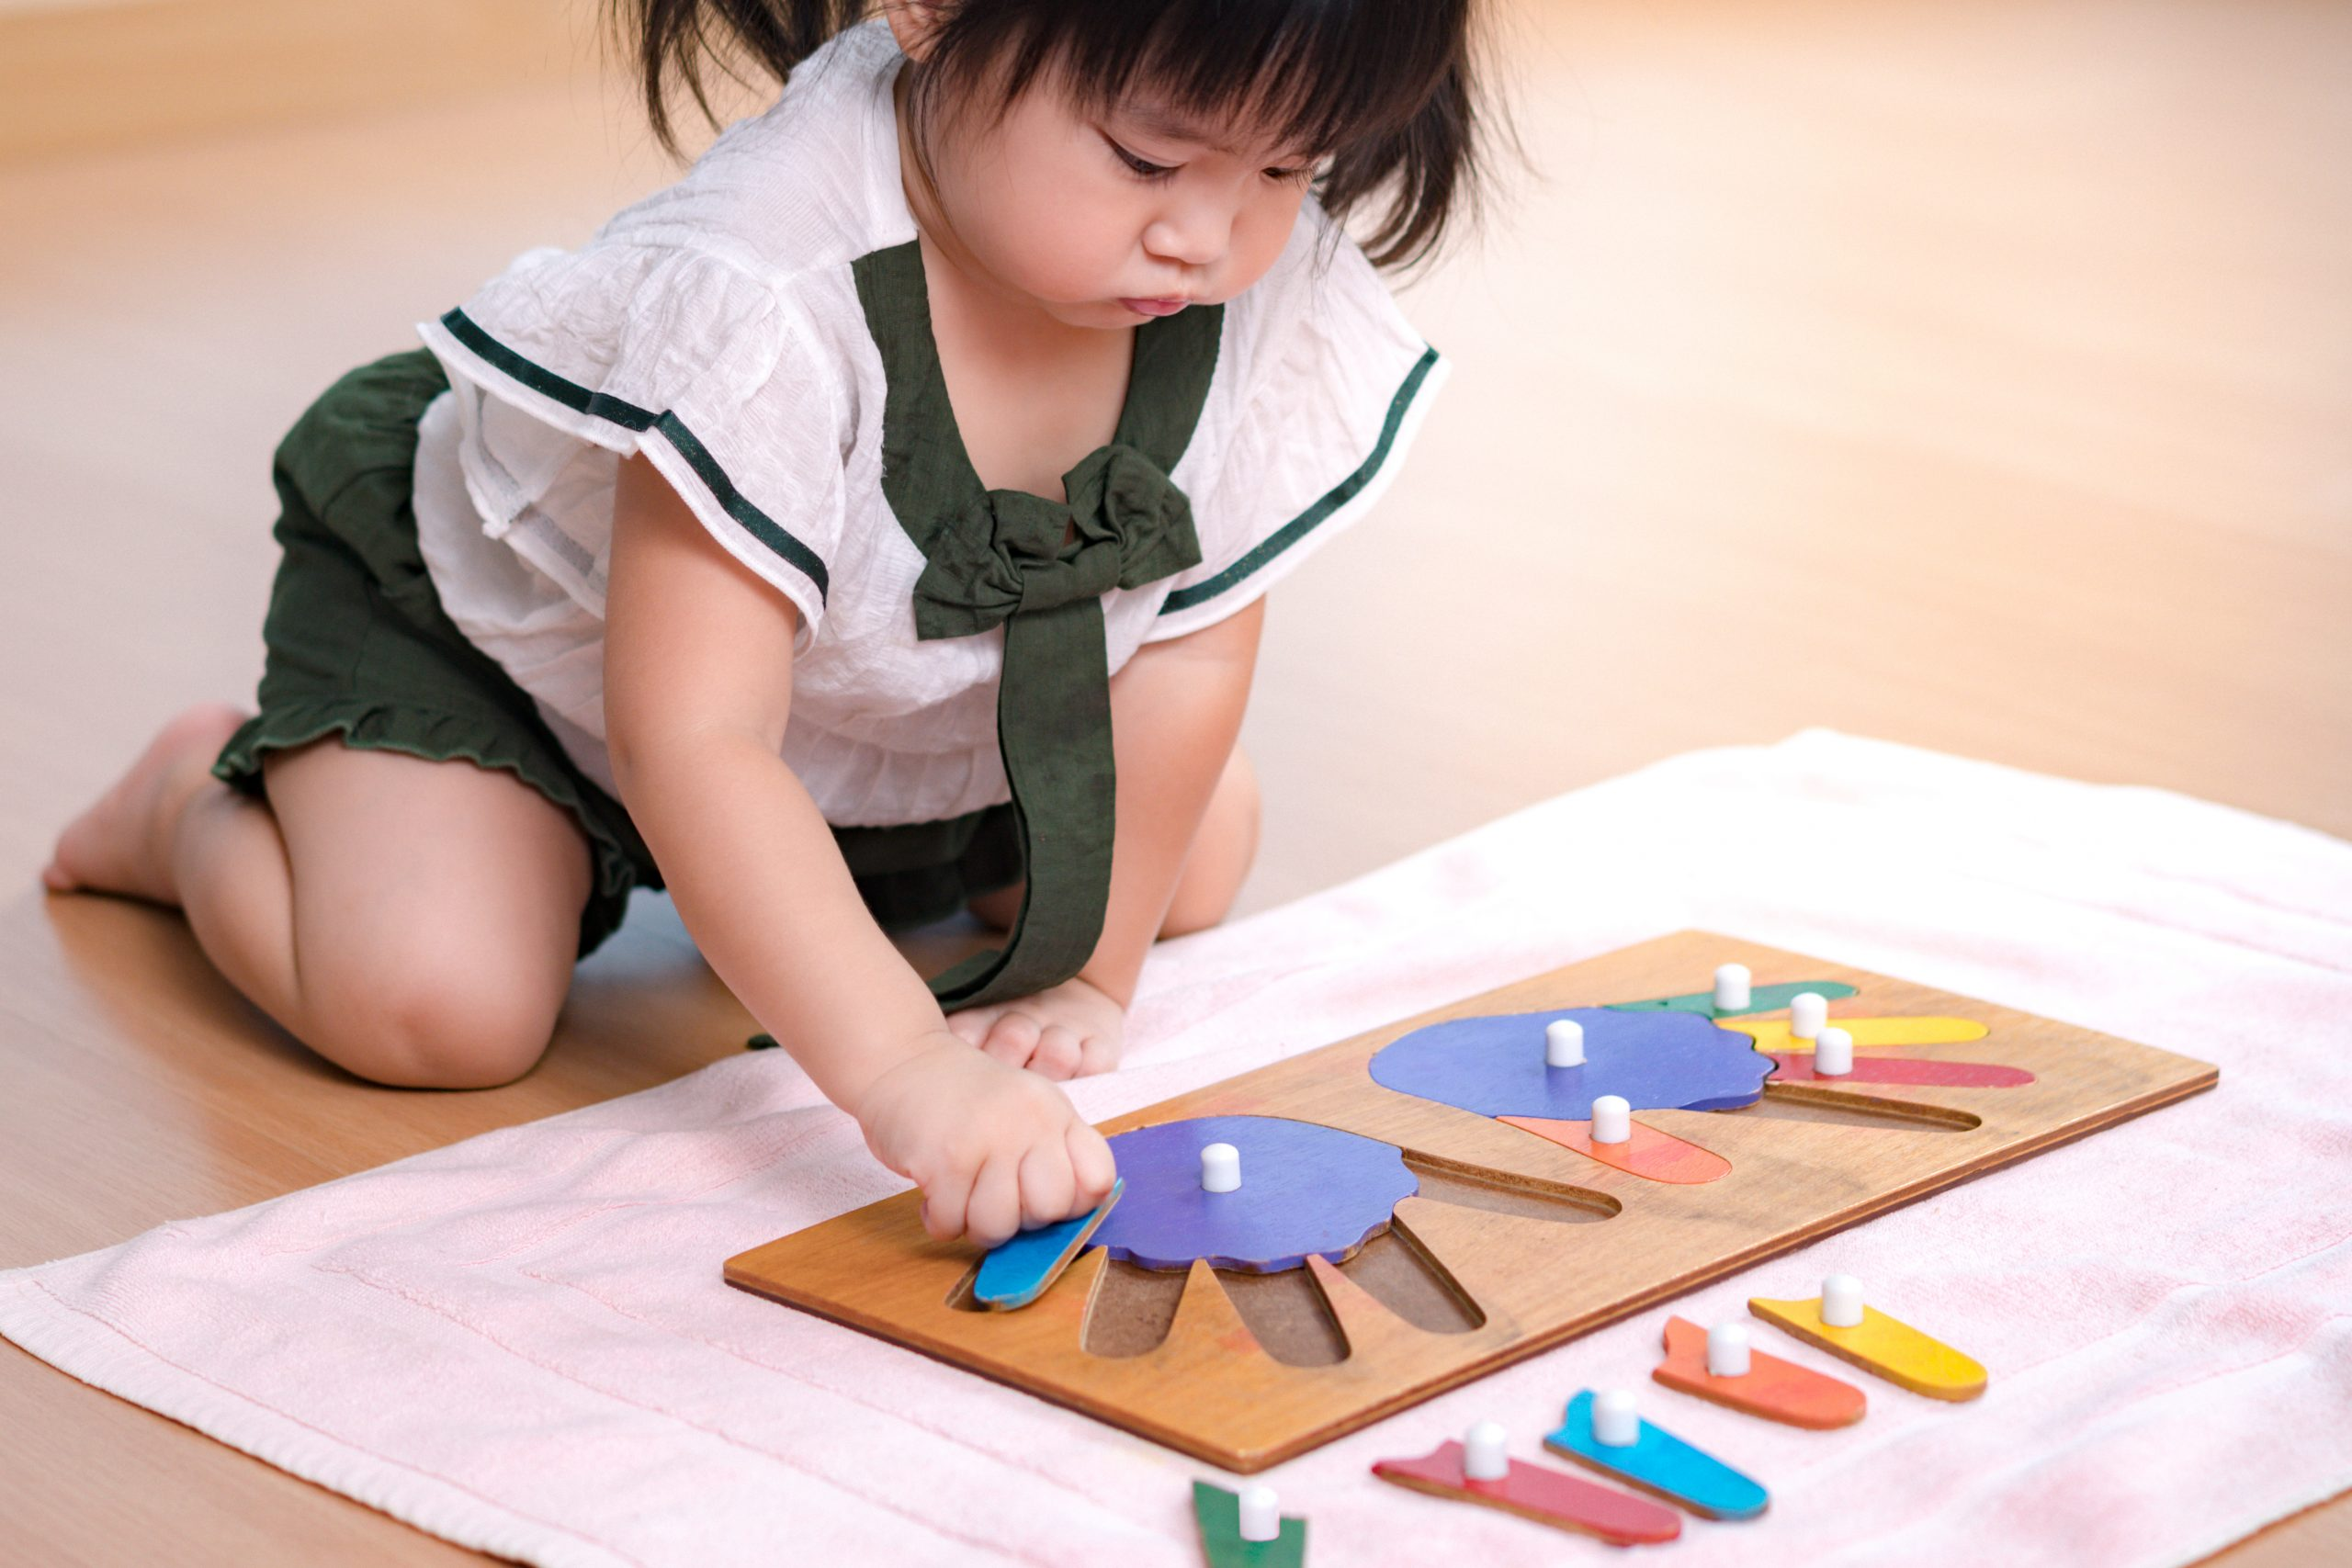 preschool little girl (2-3 years) in Montessori classroom engaged sensory wooden puzzle activity. 10 fingers, Fine motor skills, Montessori method, Child development, Early education